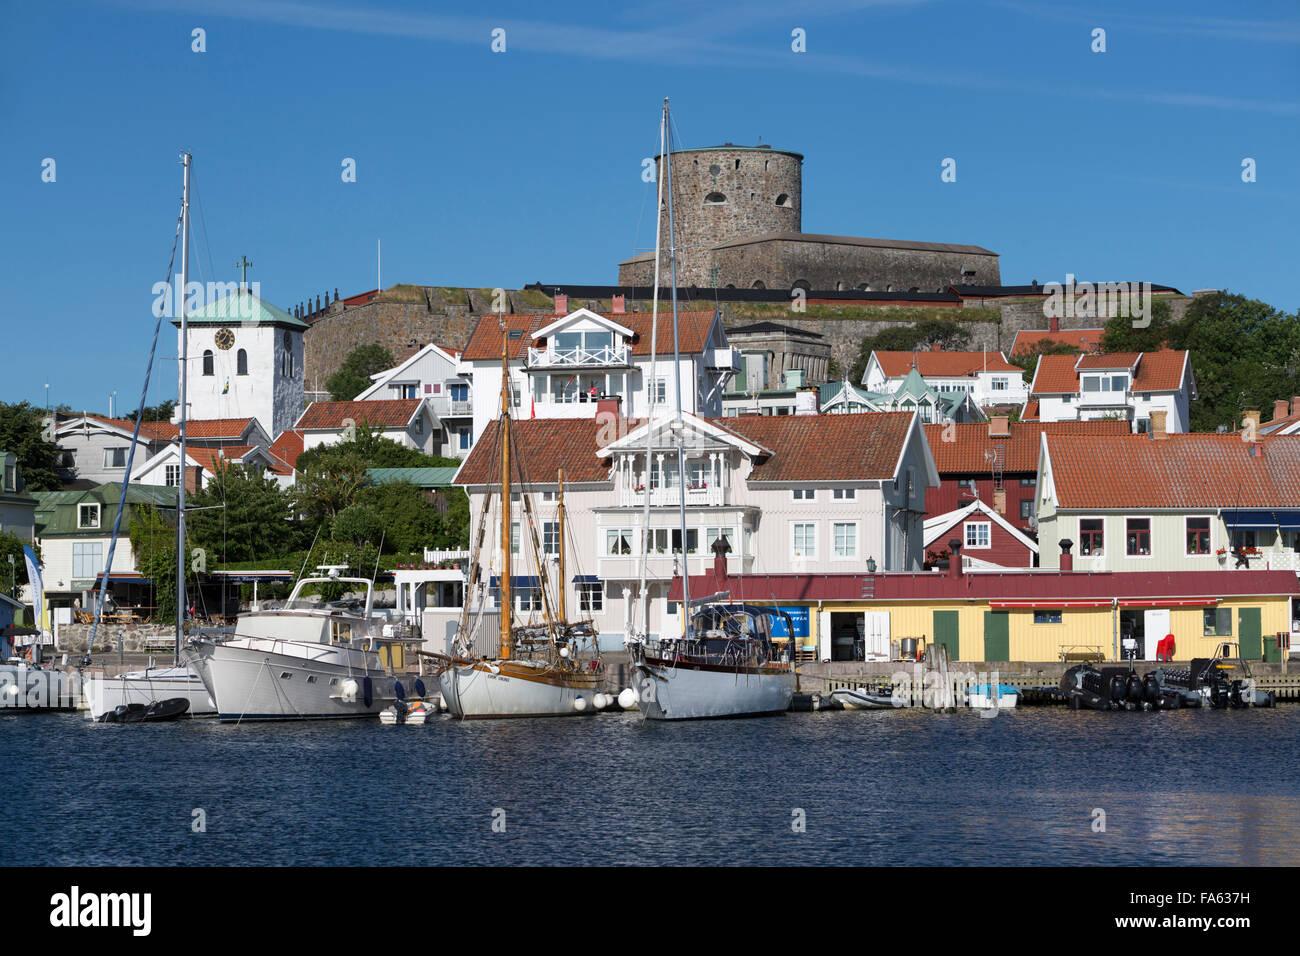 Carlstens fortress (Carlstens fastning) and harbour, Marstrand, Bohuslan Coast, southwest Sweden, Sweden, Europe - Stock Image